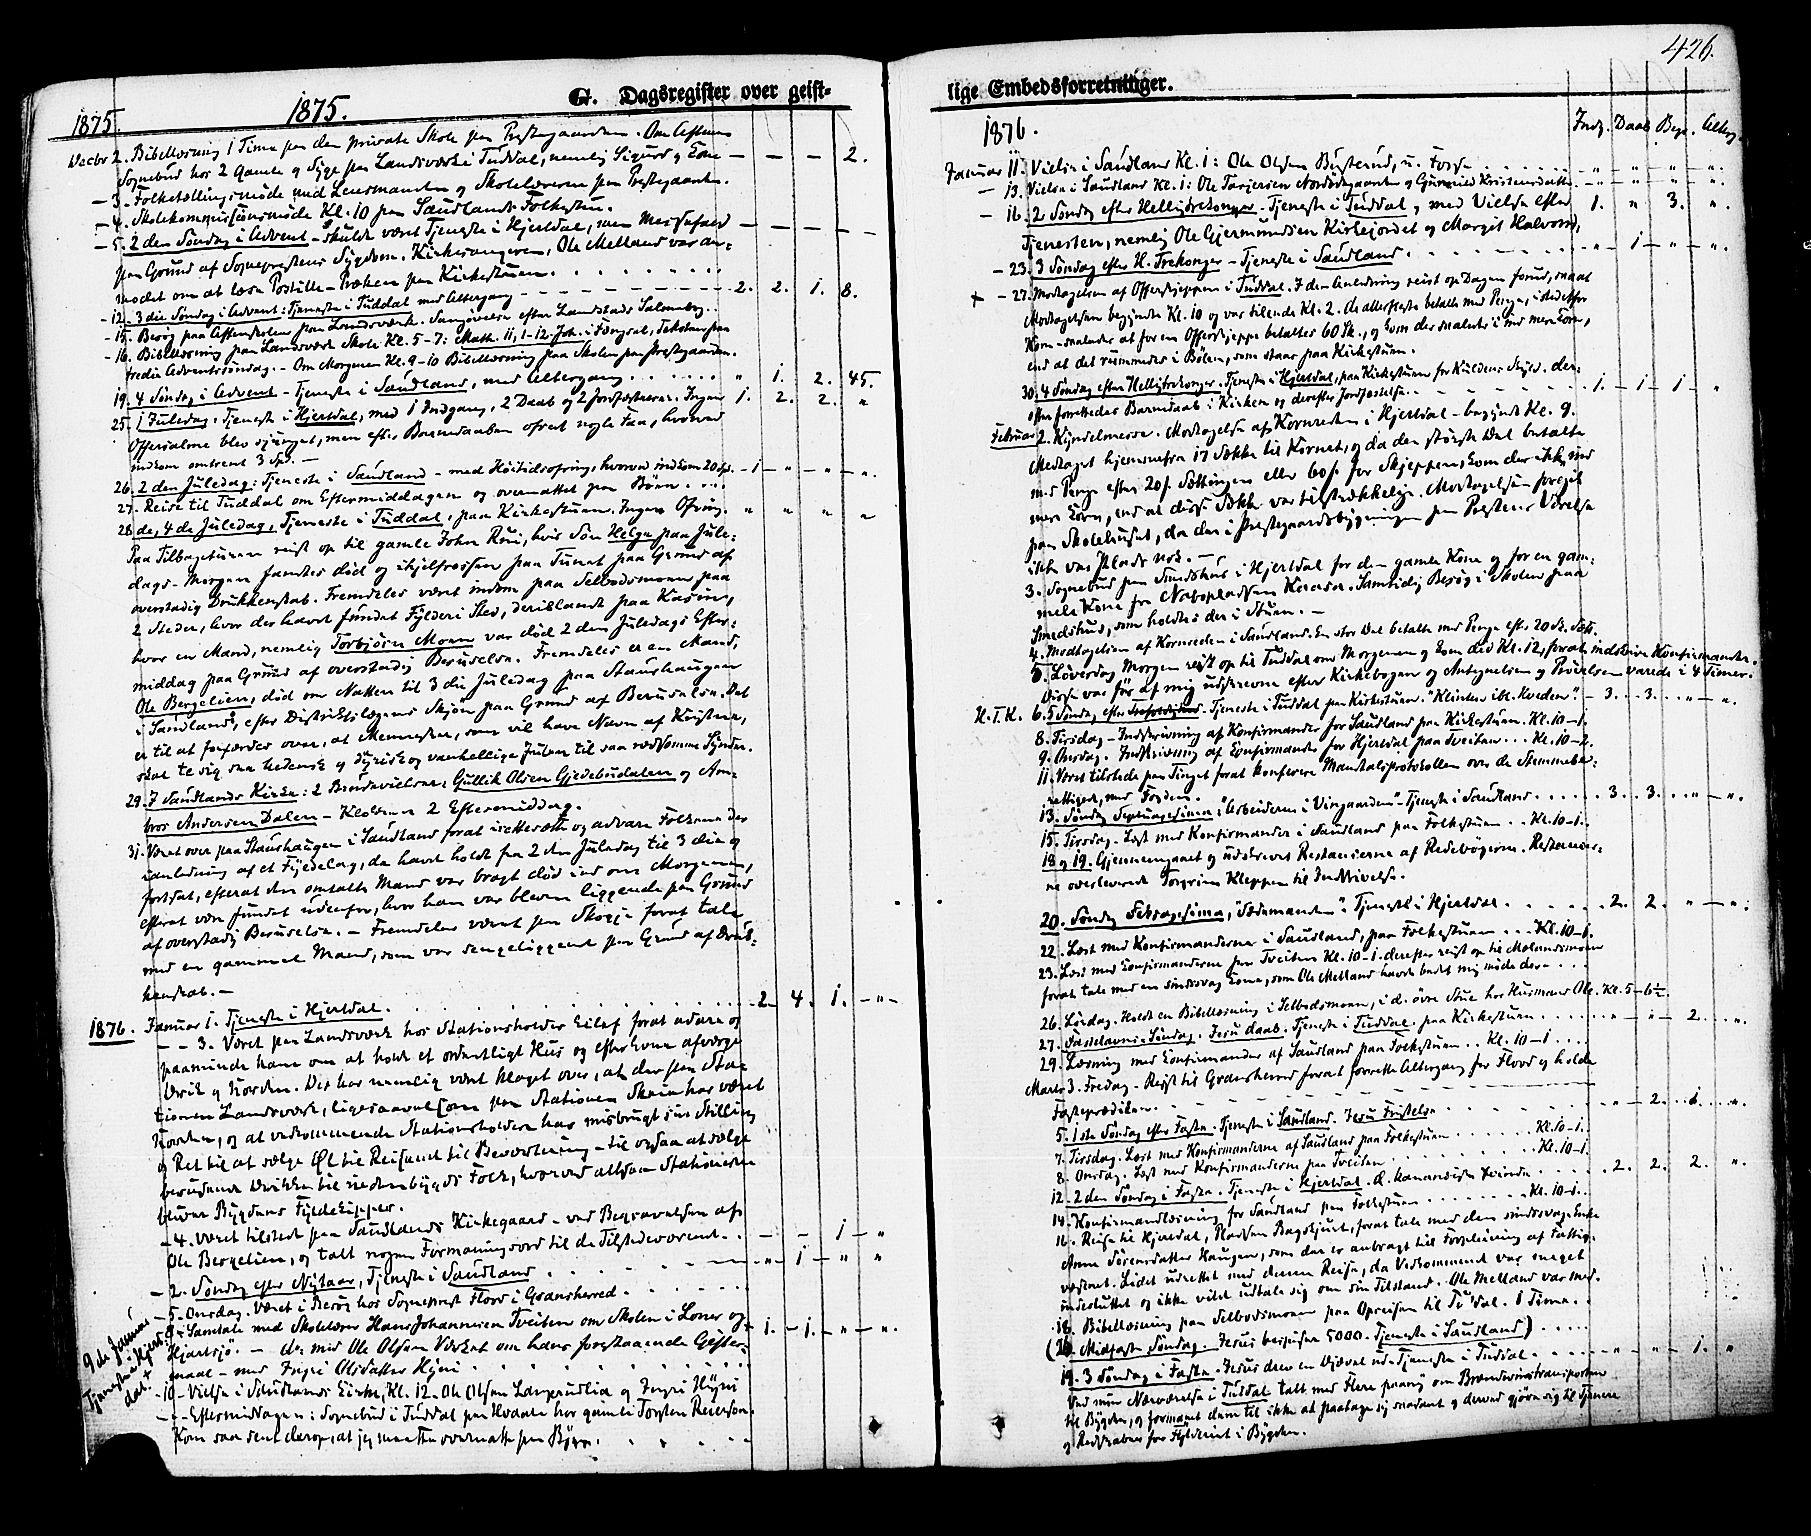 SAKO, Hjartdal kirkebøker, F/Fa/L0009: Ministerialbok nr. I 9, 1860-1879, s. 426